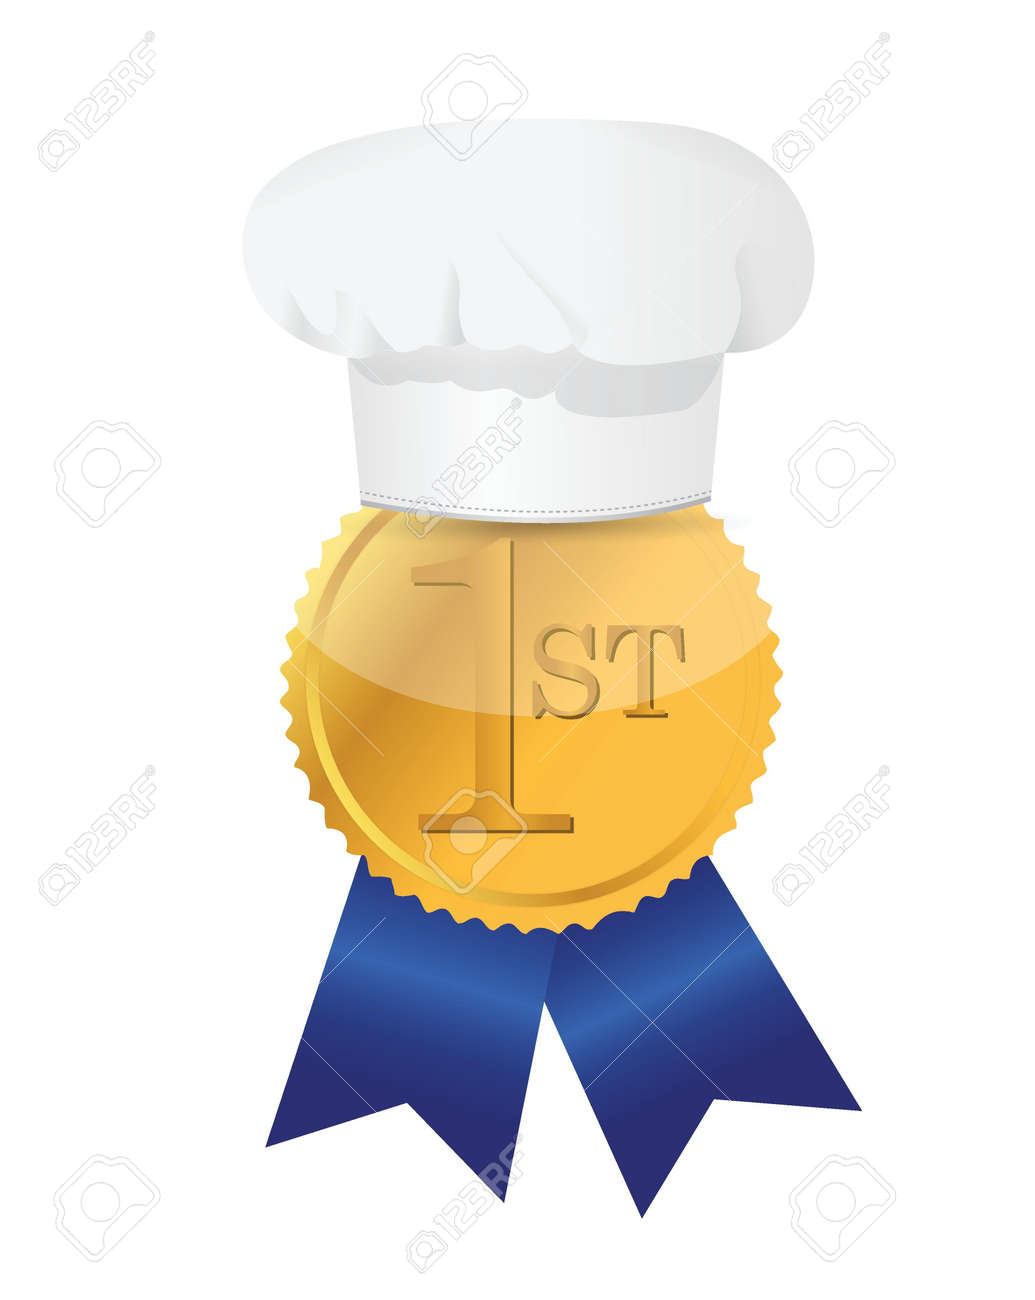 1st ribbon